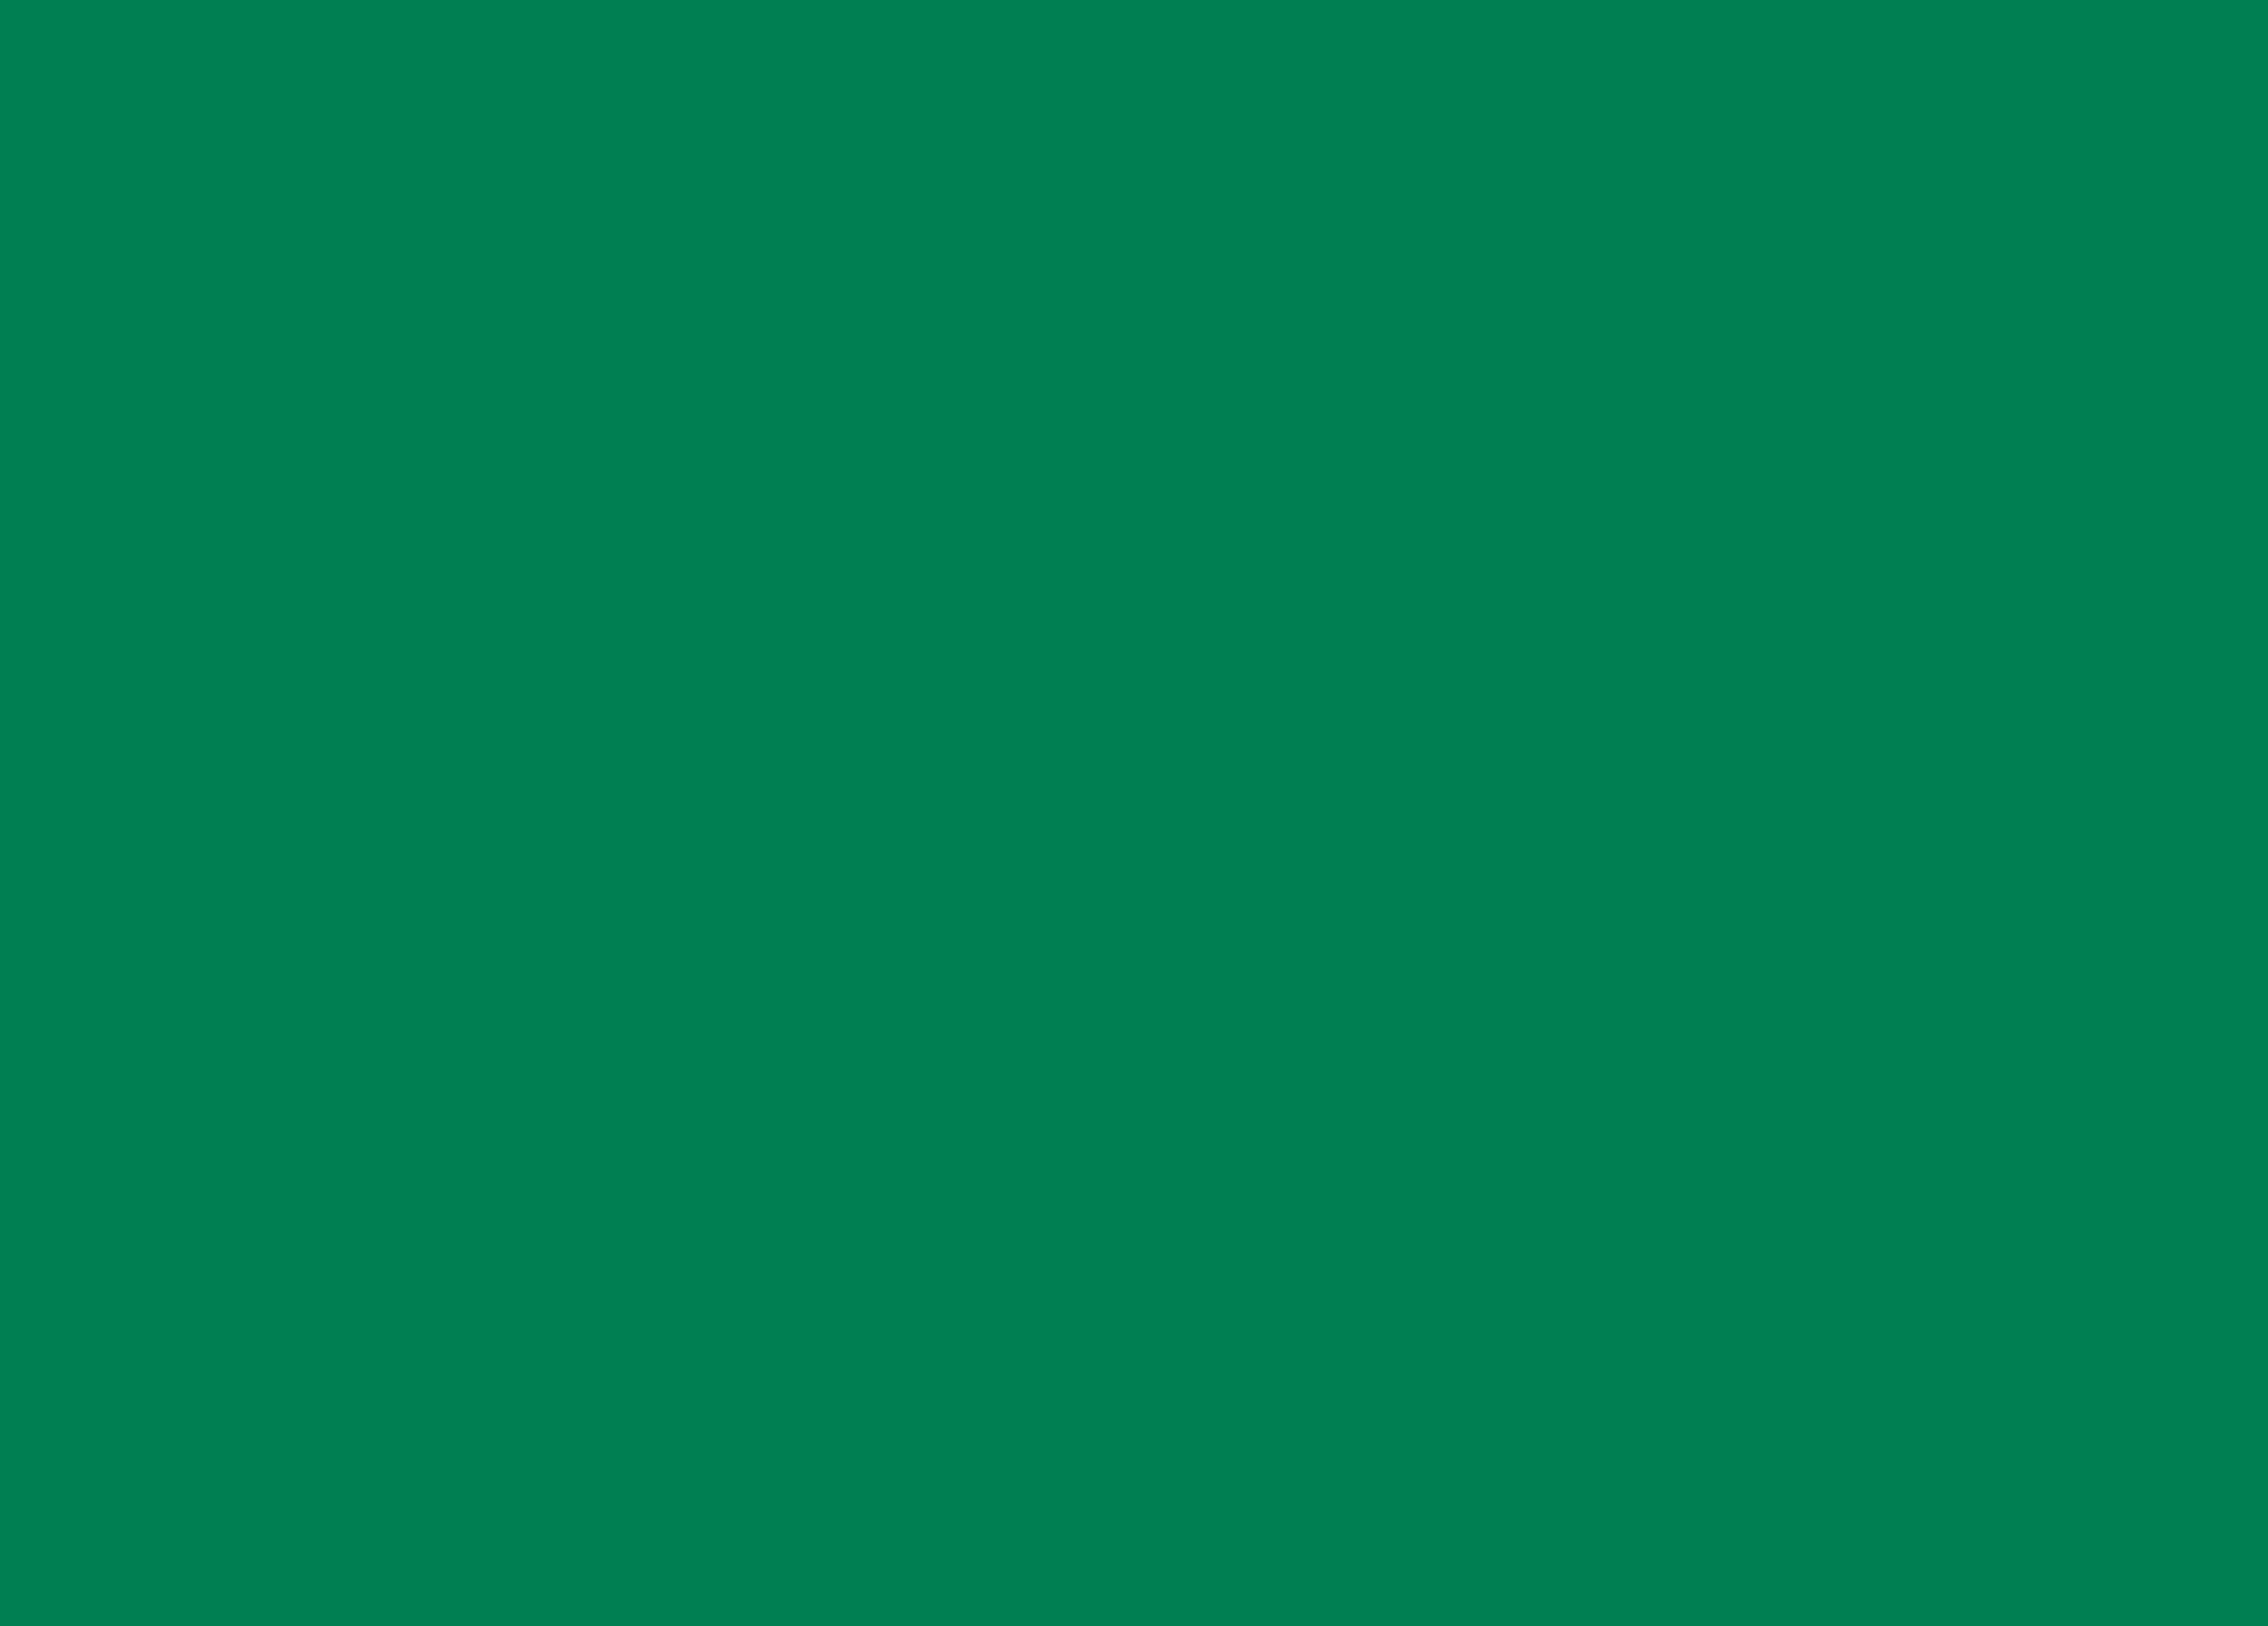 Verde Escuro - 11066